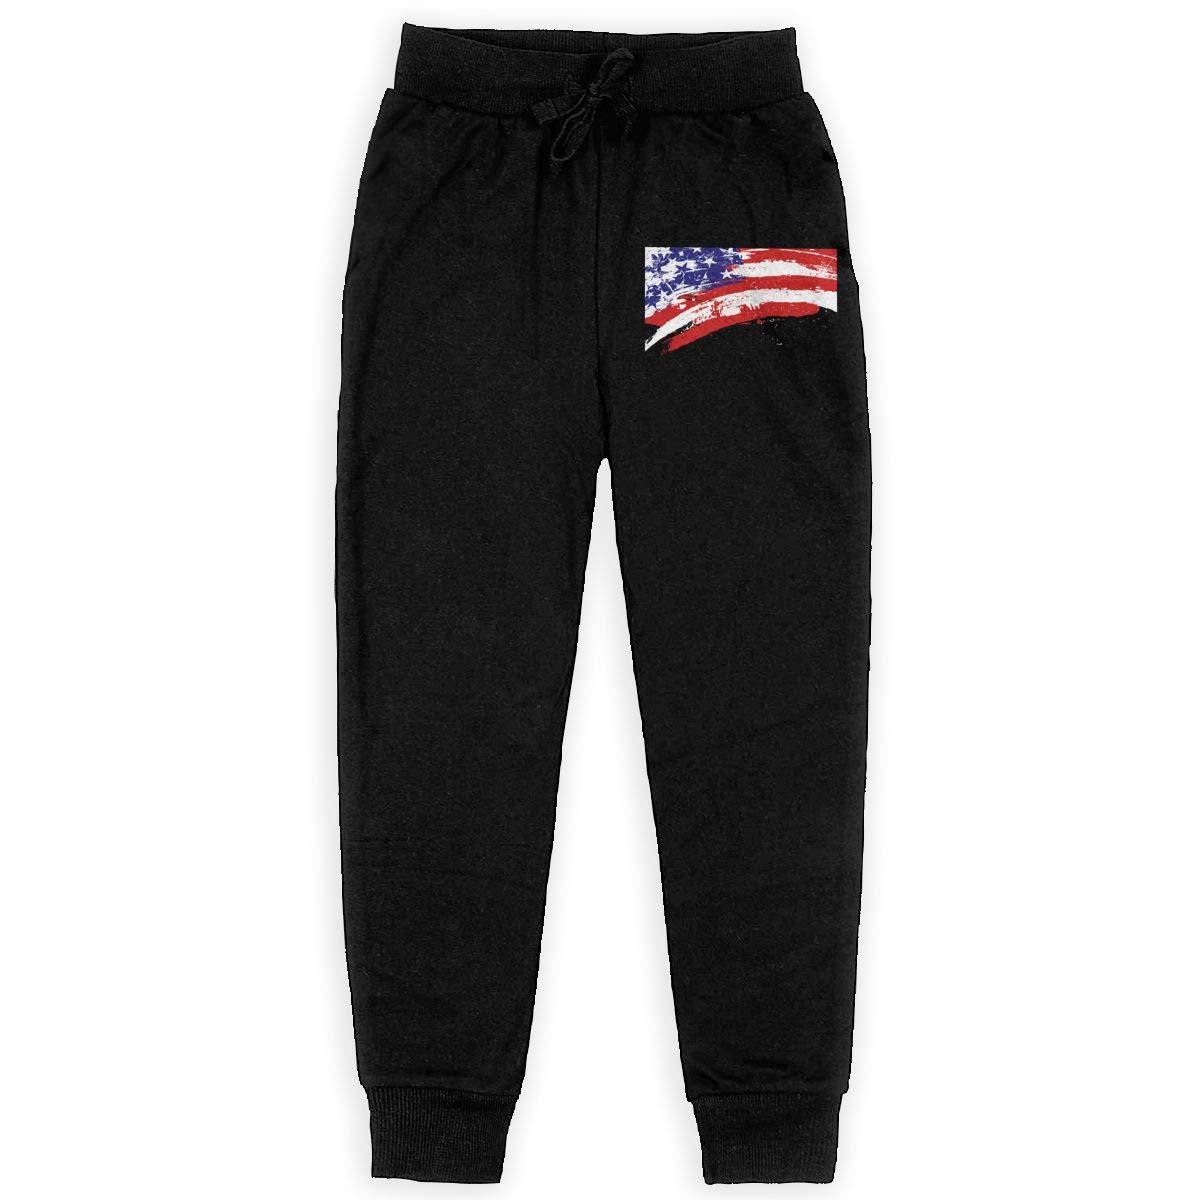 IufnNRJndfu USA Flag Boys Athletic Smart Fleece Pant Youth Soft and Cozy Sweatpants